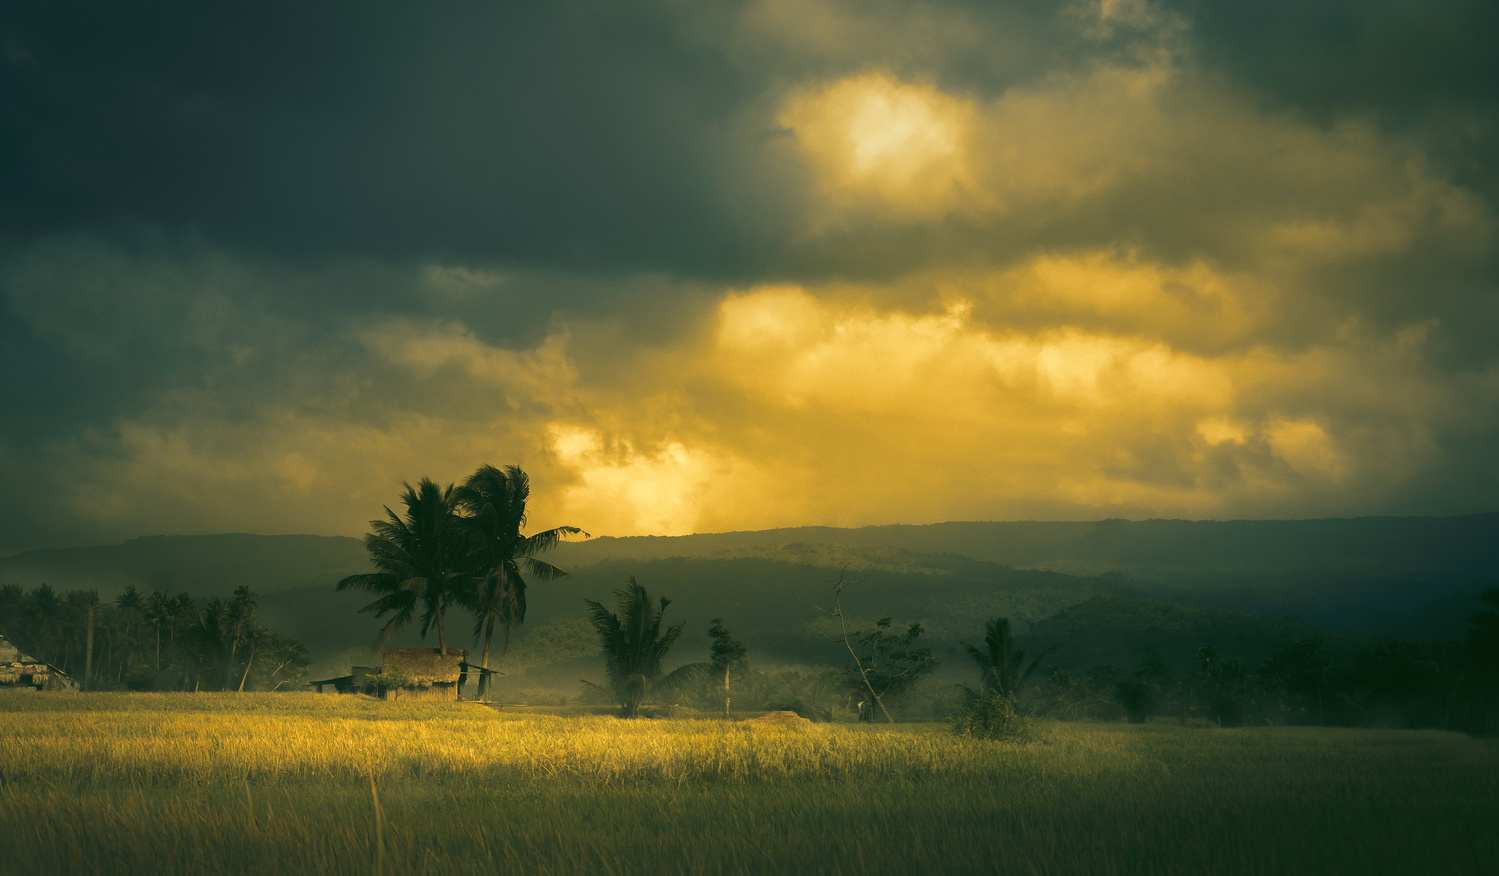 Home of a Farmer by Art Estole